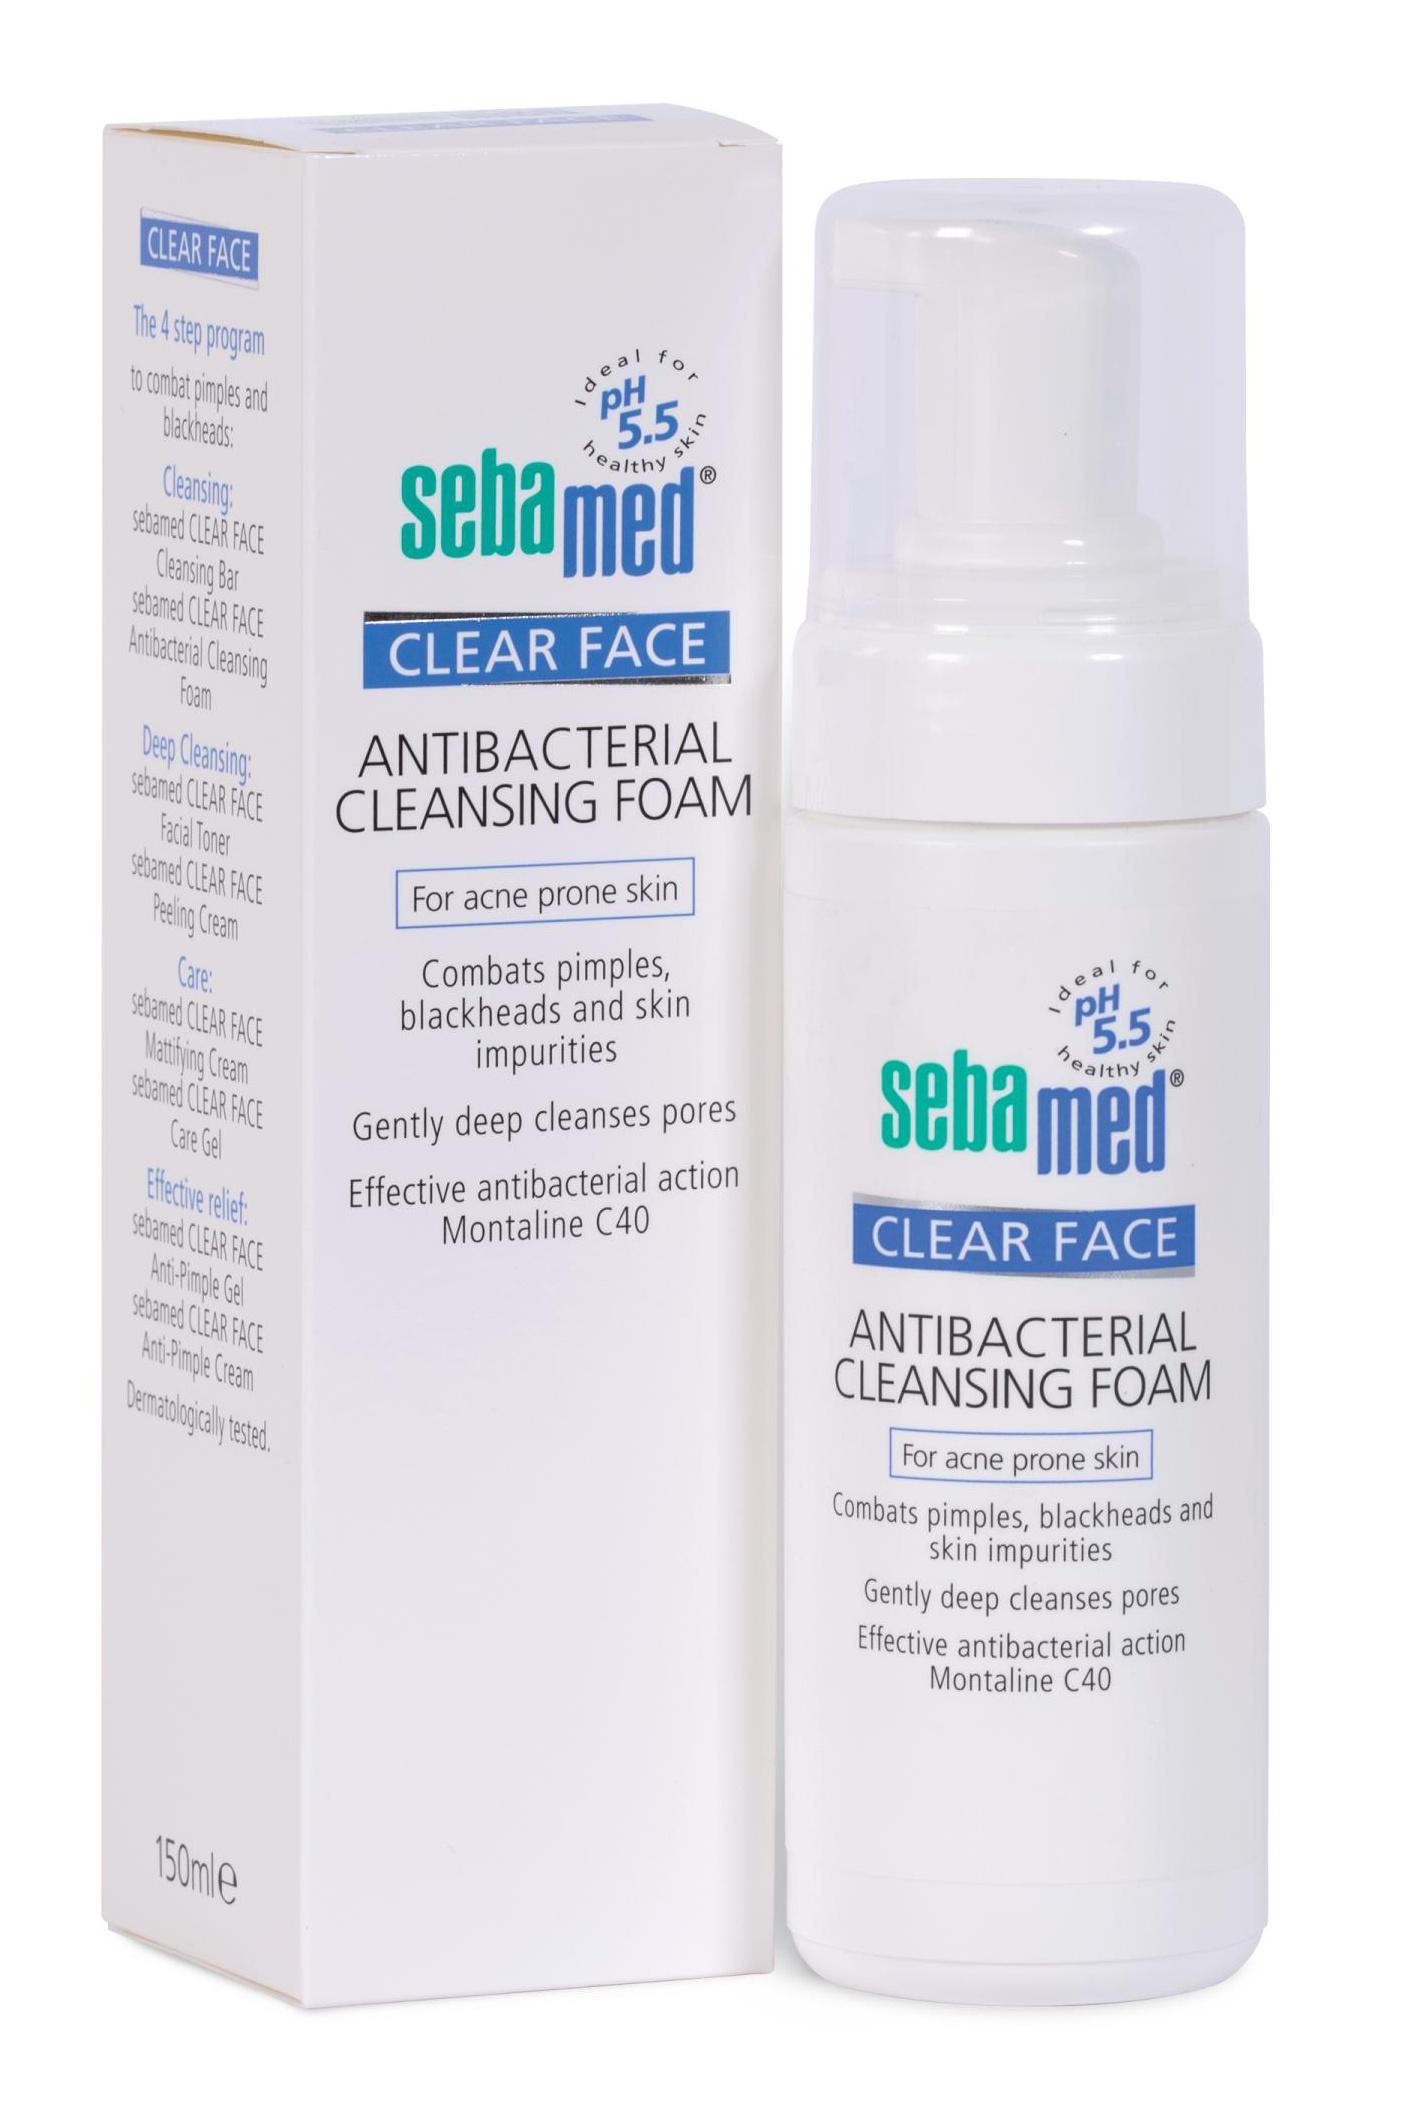 Sebamed Clear Face Antibacterial Cleansing Foam